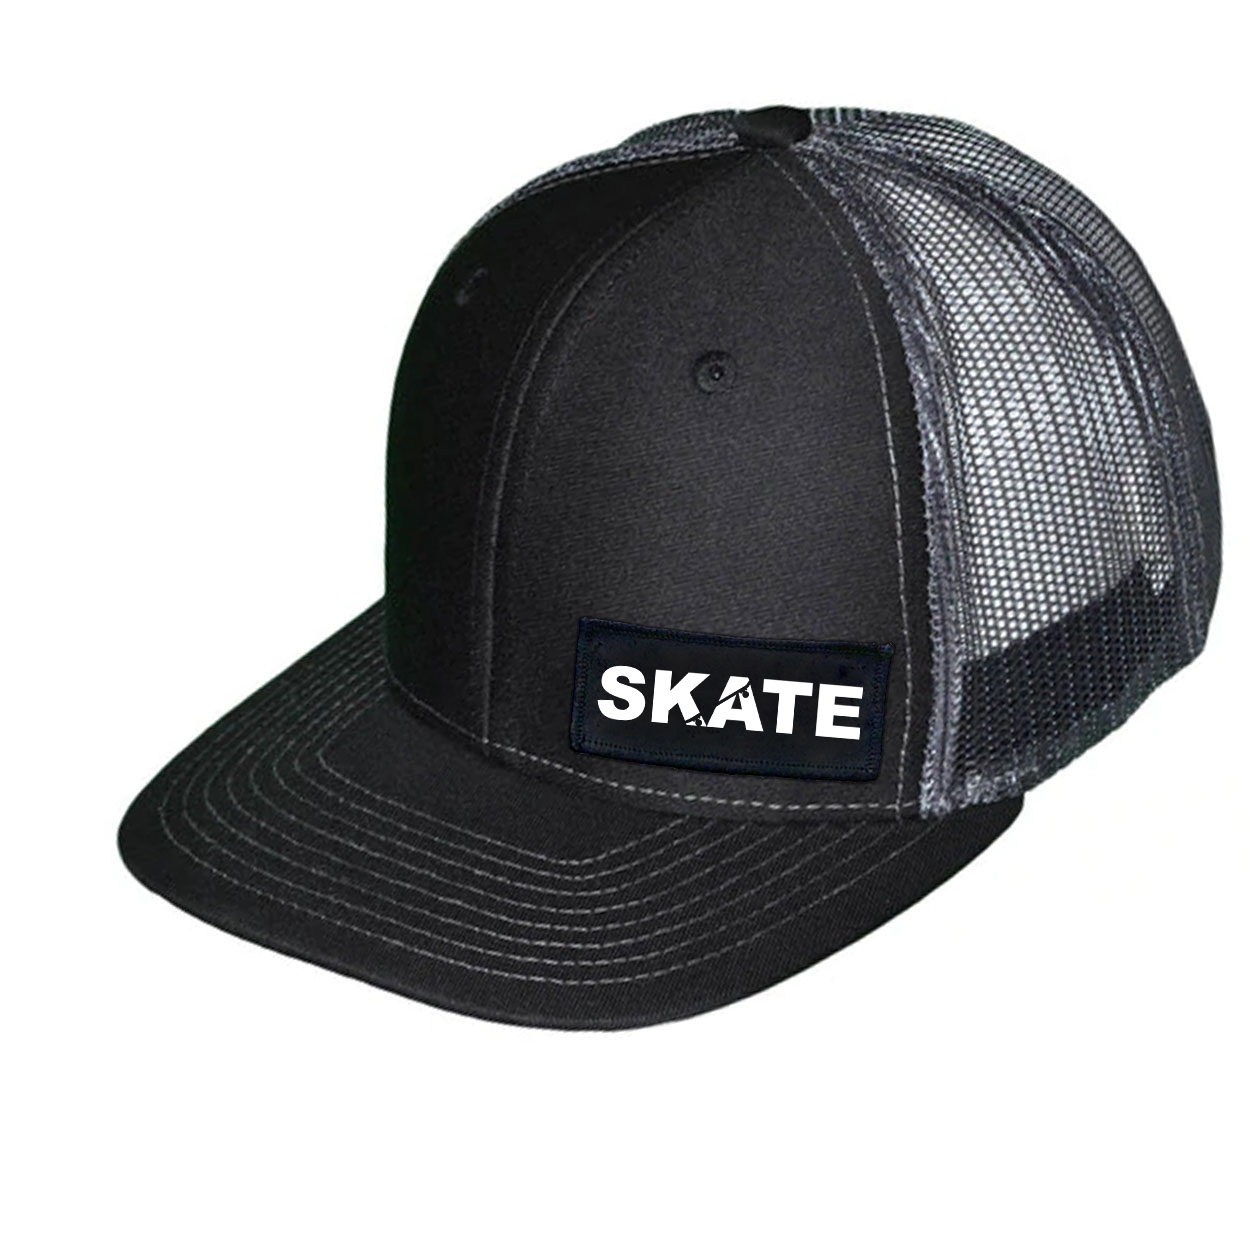 Skate Ollie Skateboard Logo Night Out Woven Patch Snapback Trucker Hat Black/Dark Gray (White Logo)